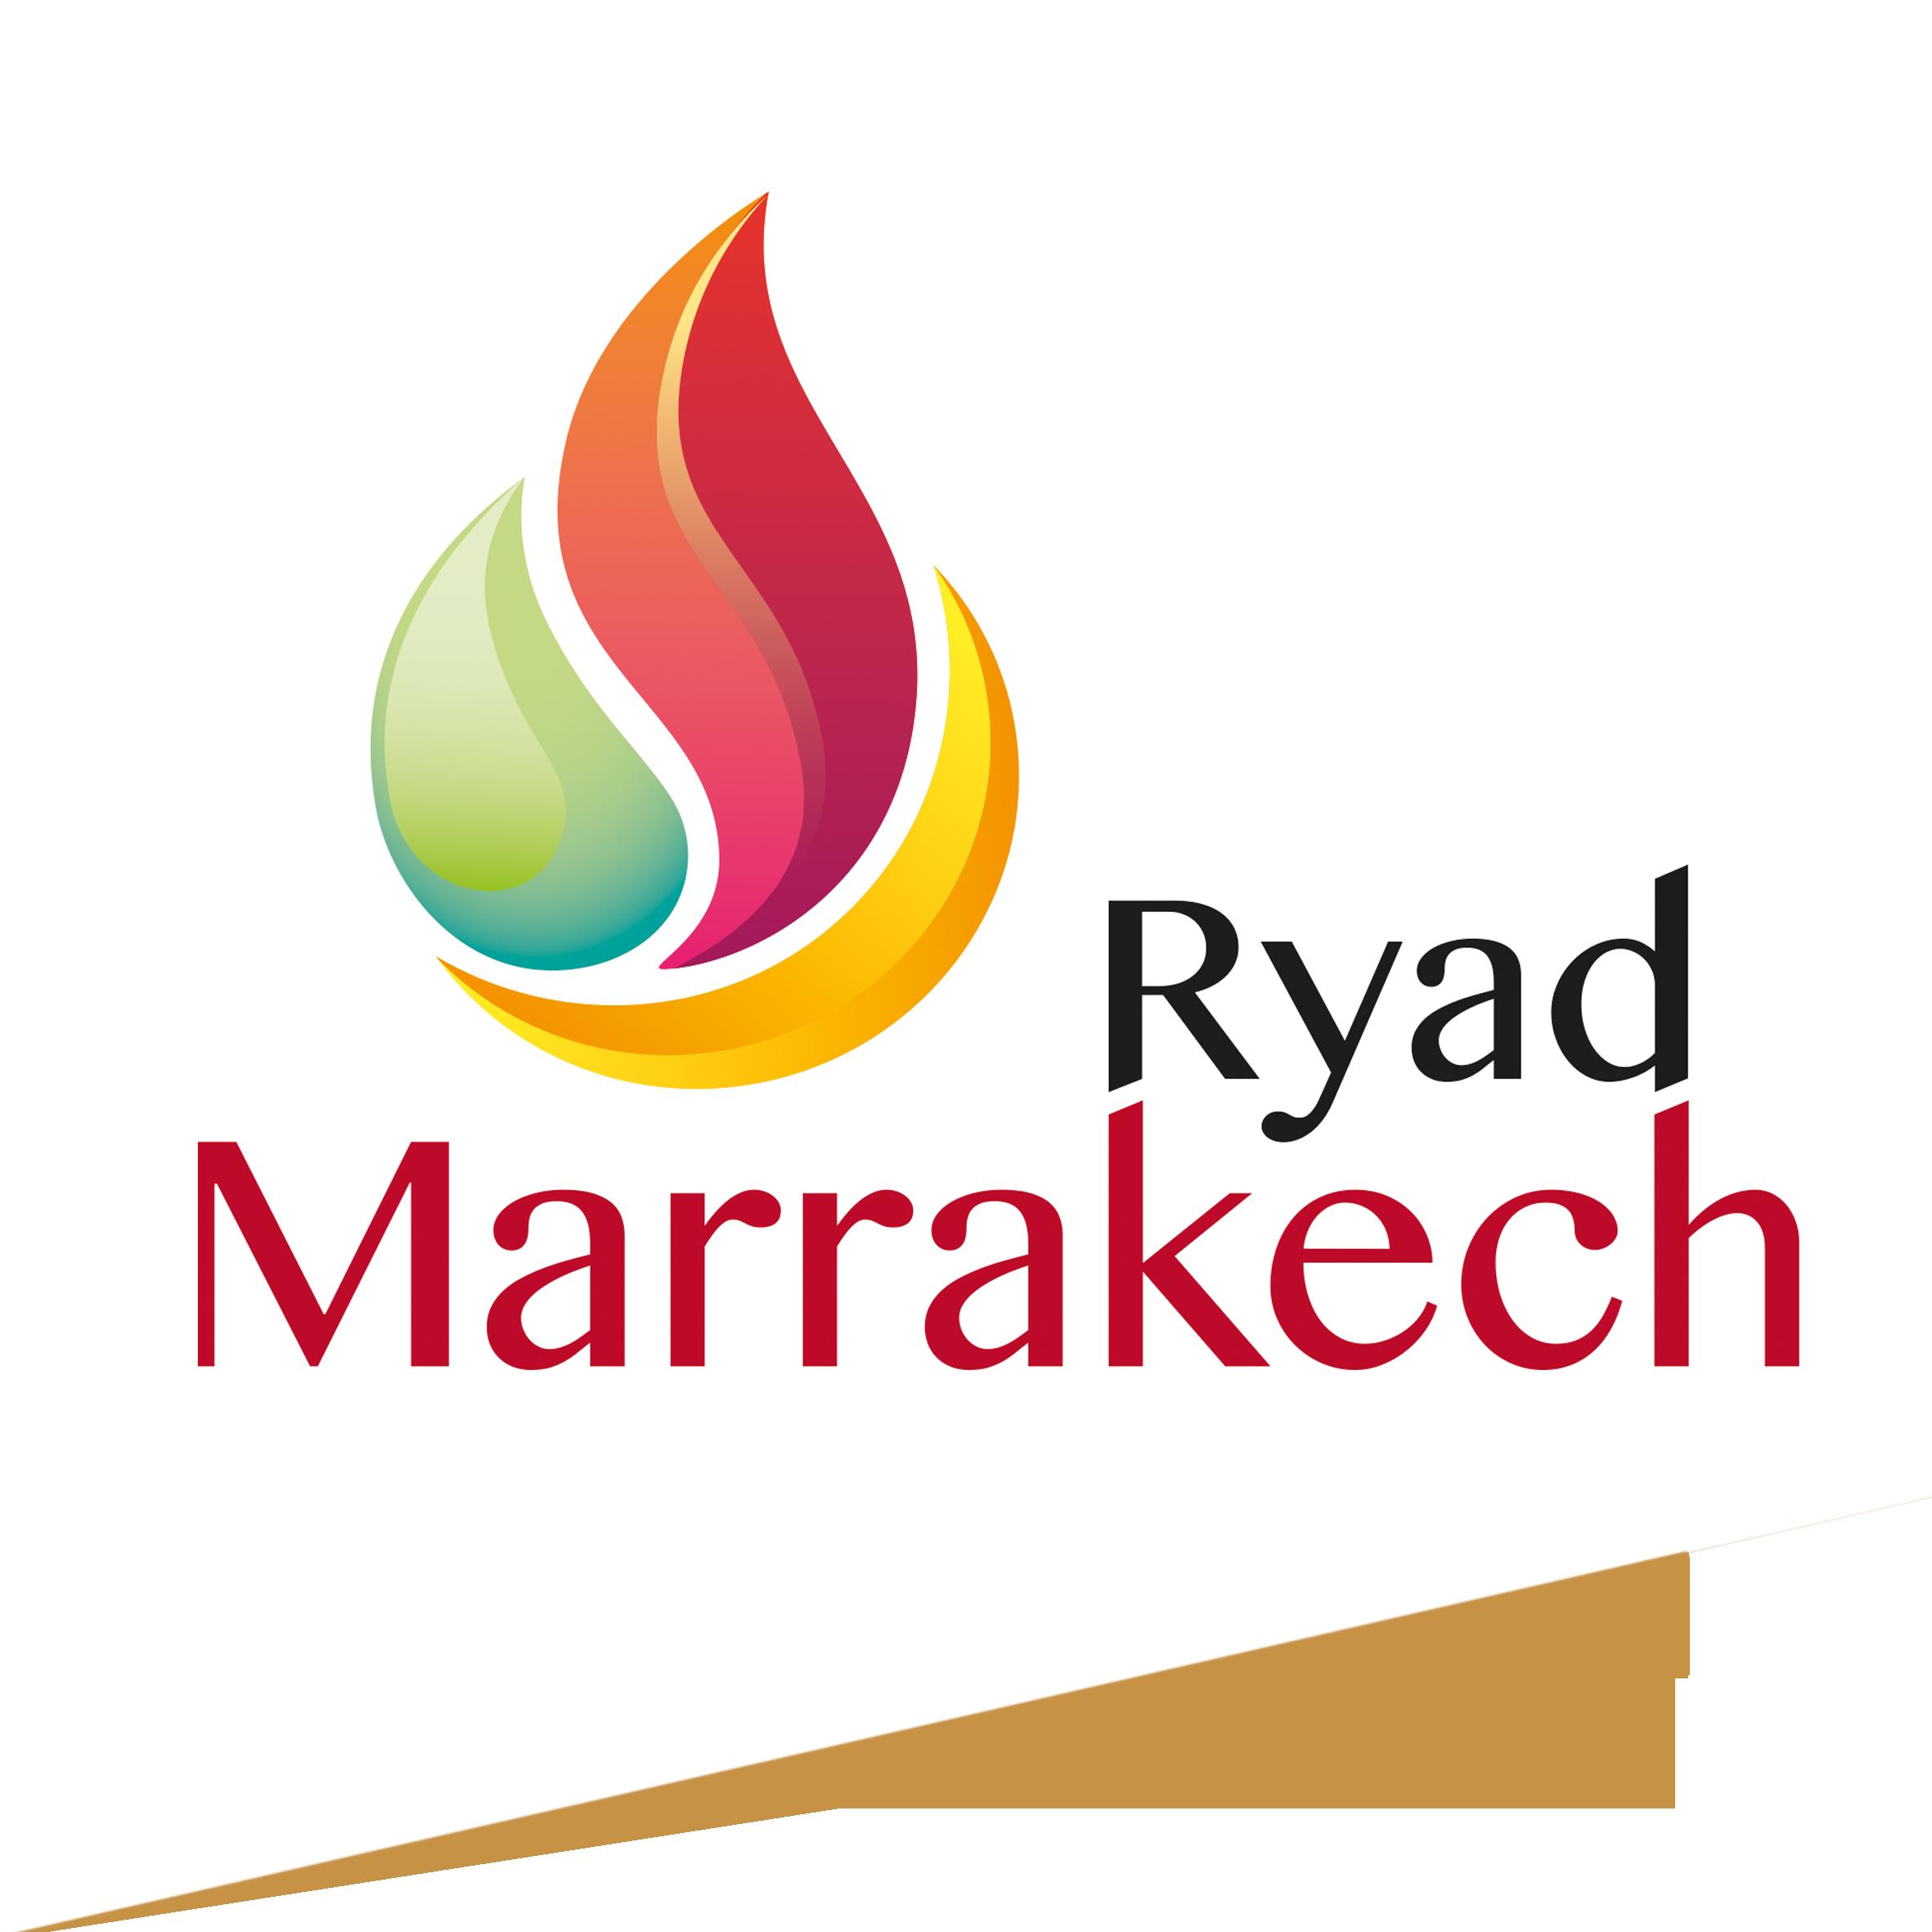 Ryad Marakech